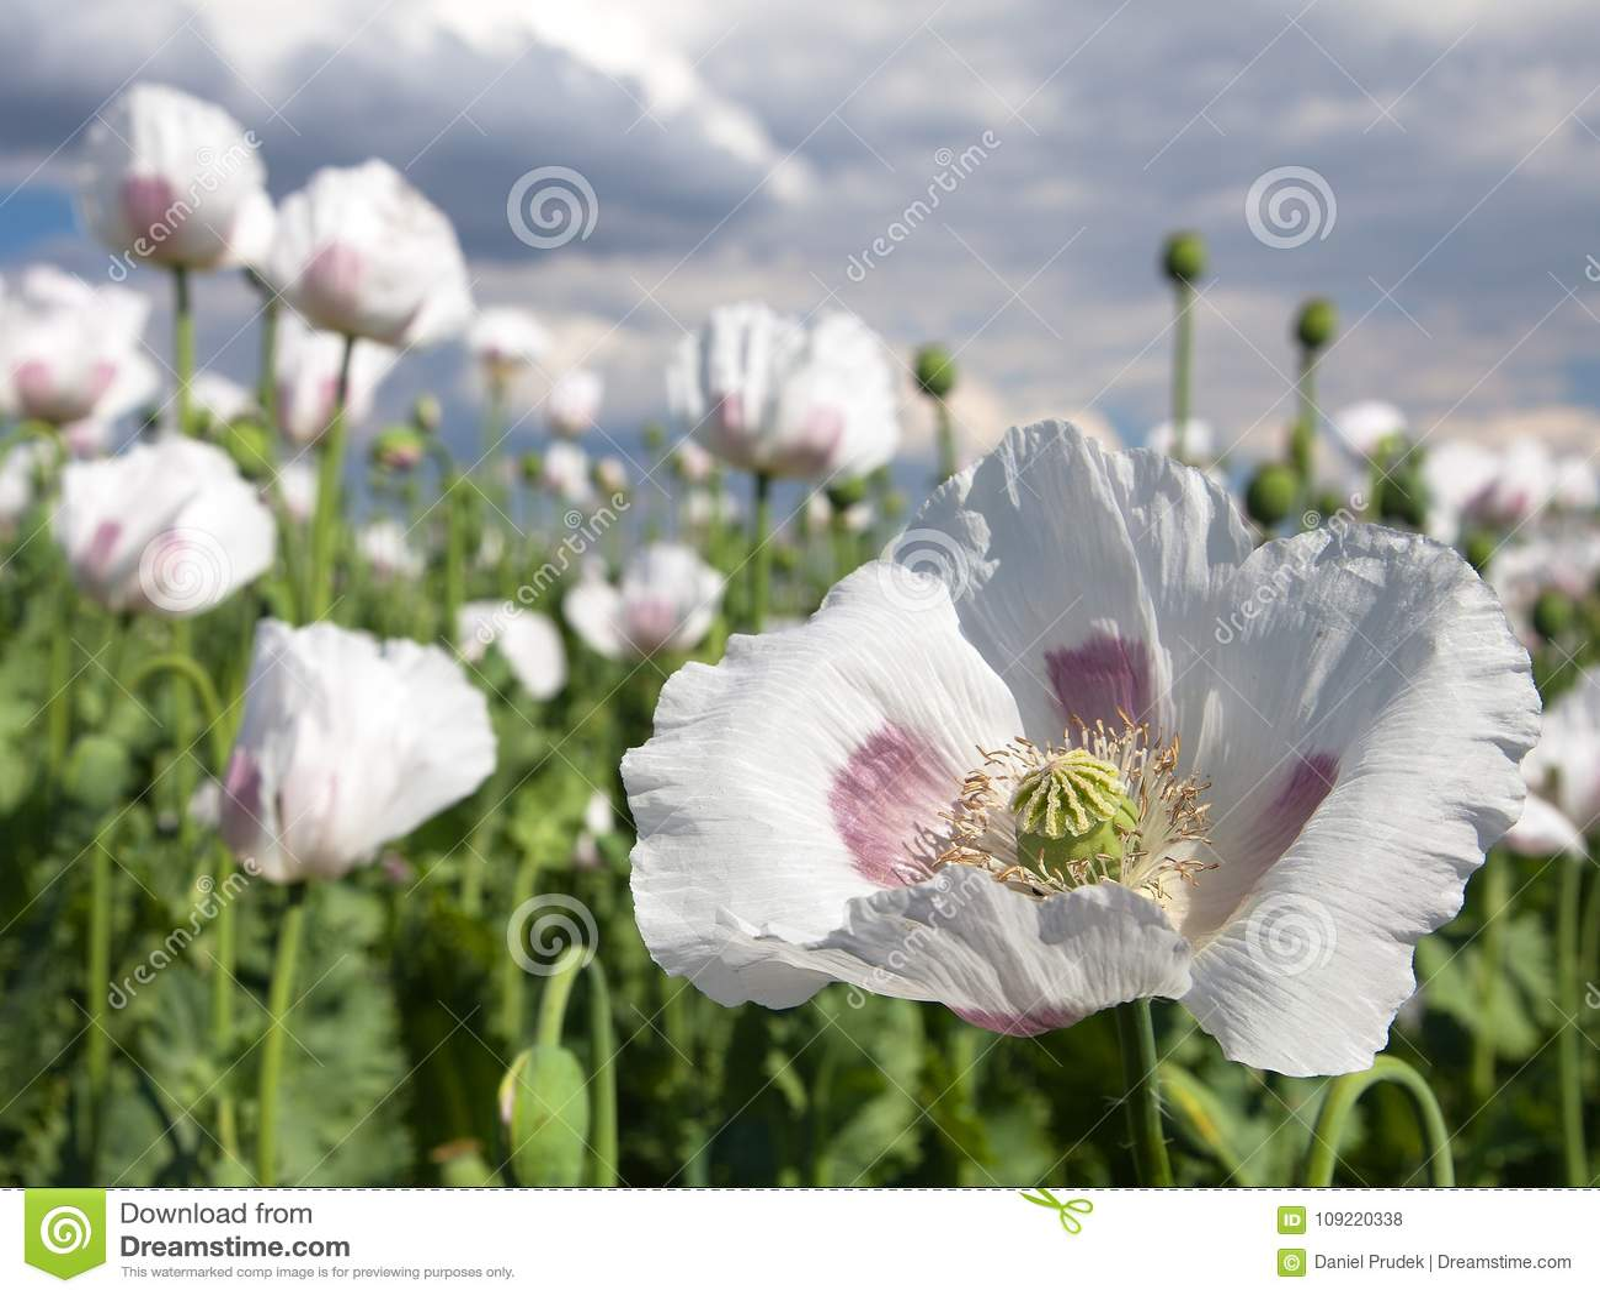 Detail Of Flowering Opium Poppy Poppy Field Stock Photo Image Of